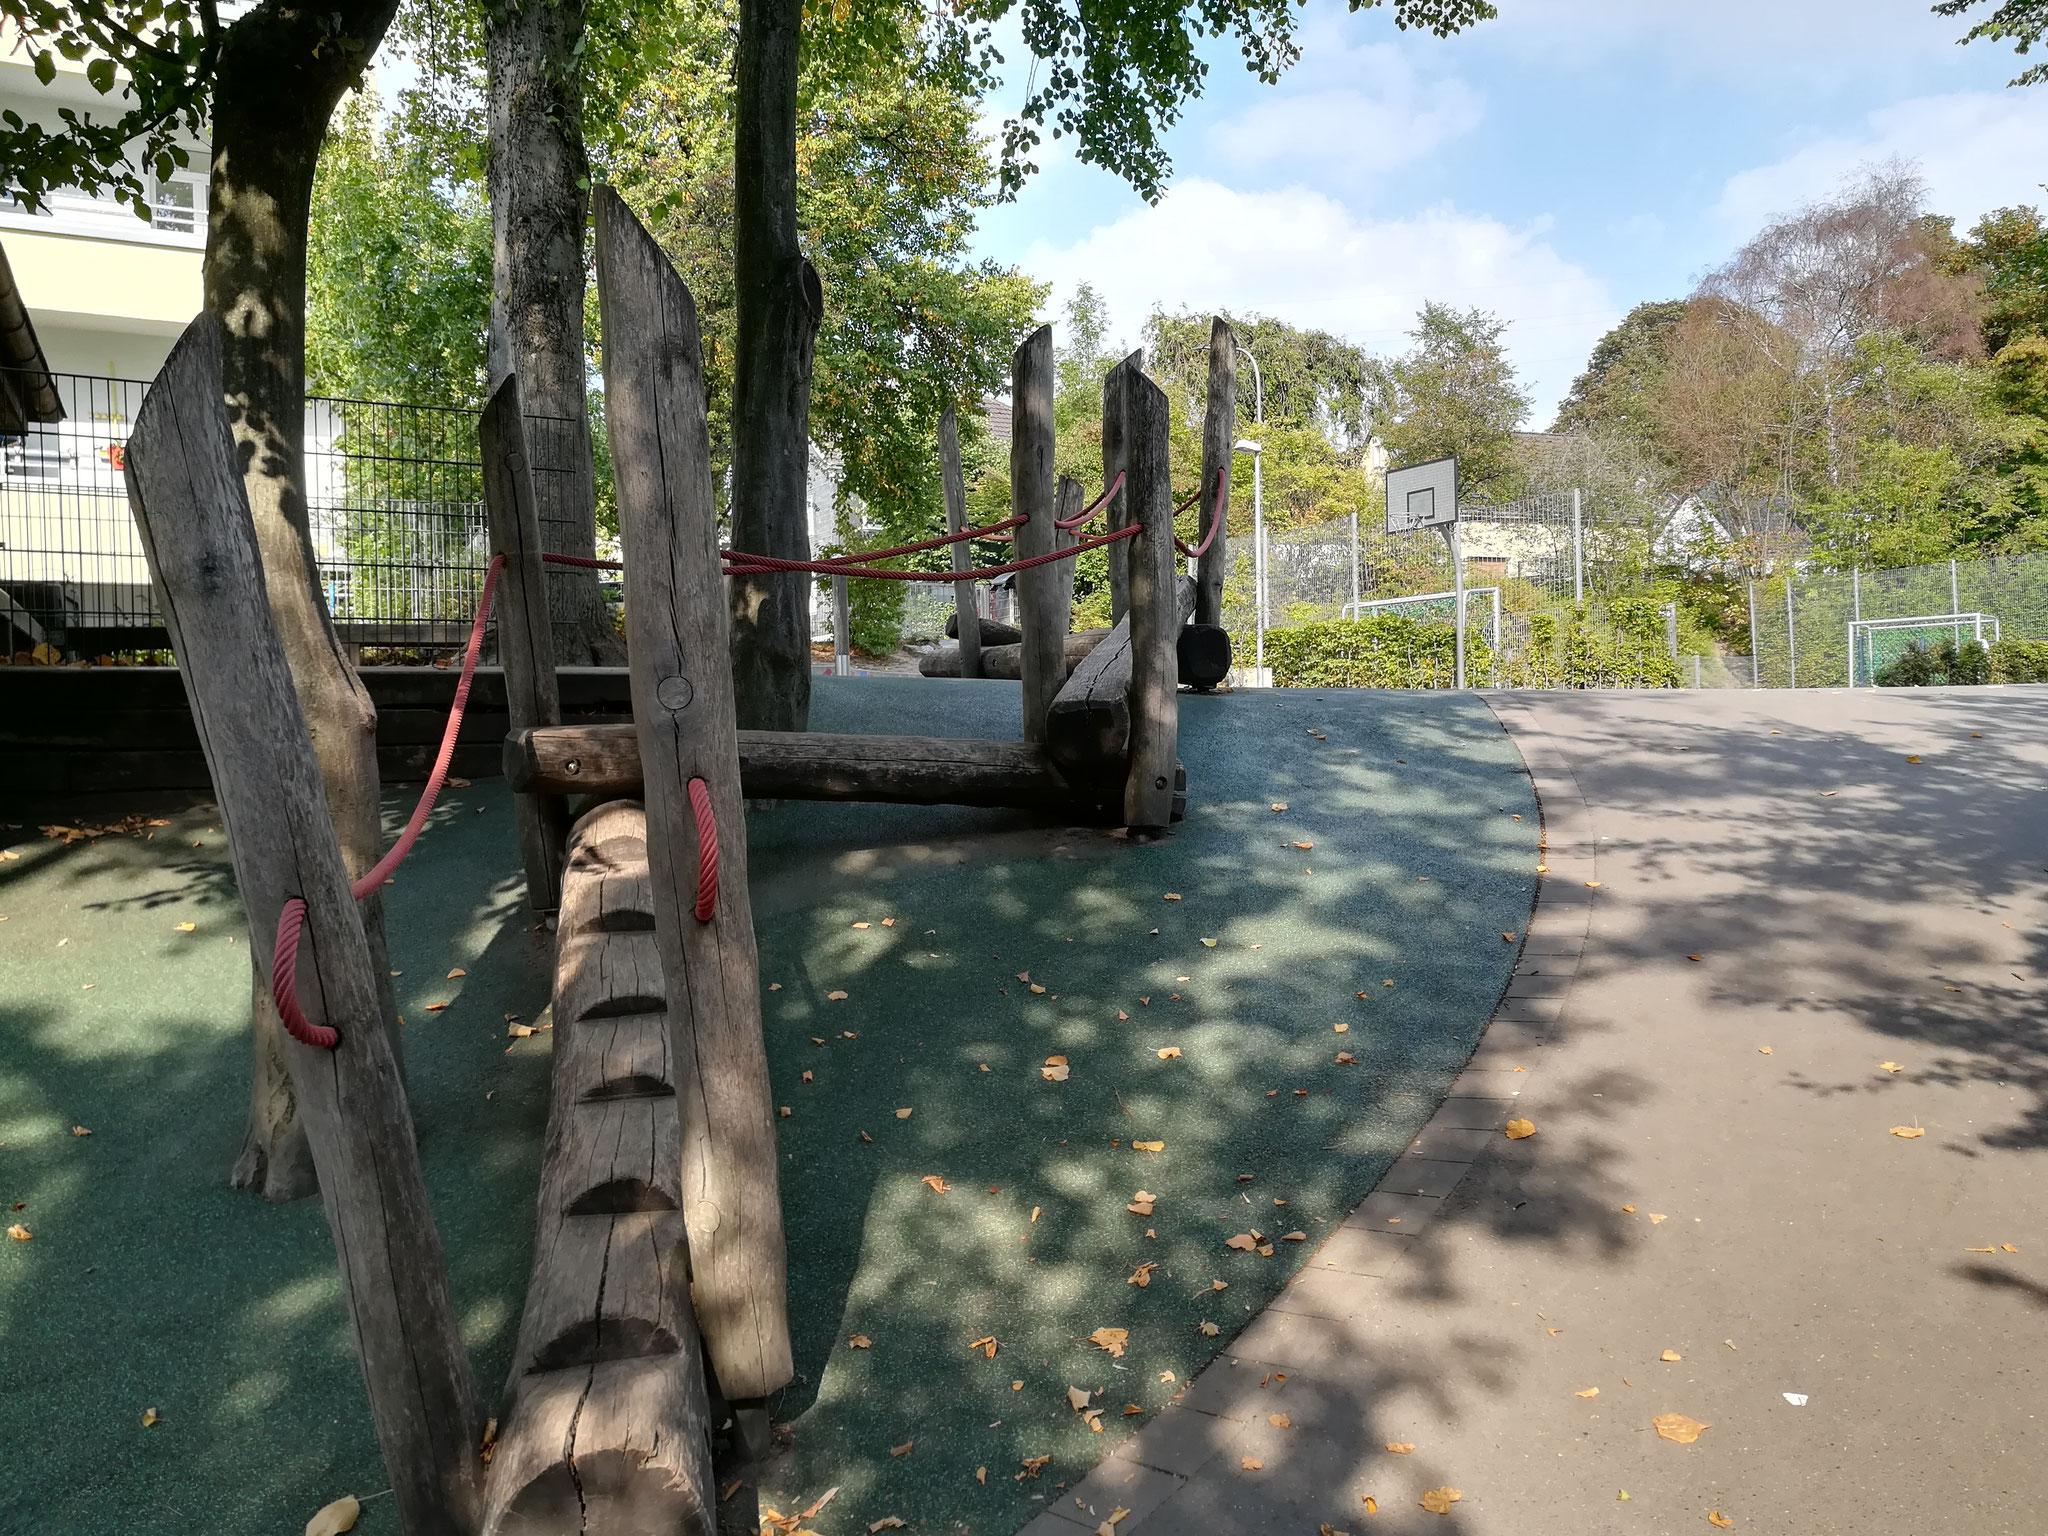 Der Weg zum oberen Schulhof